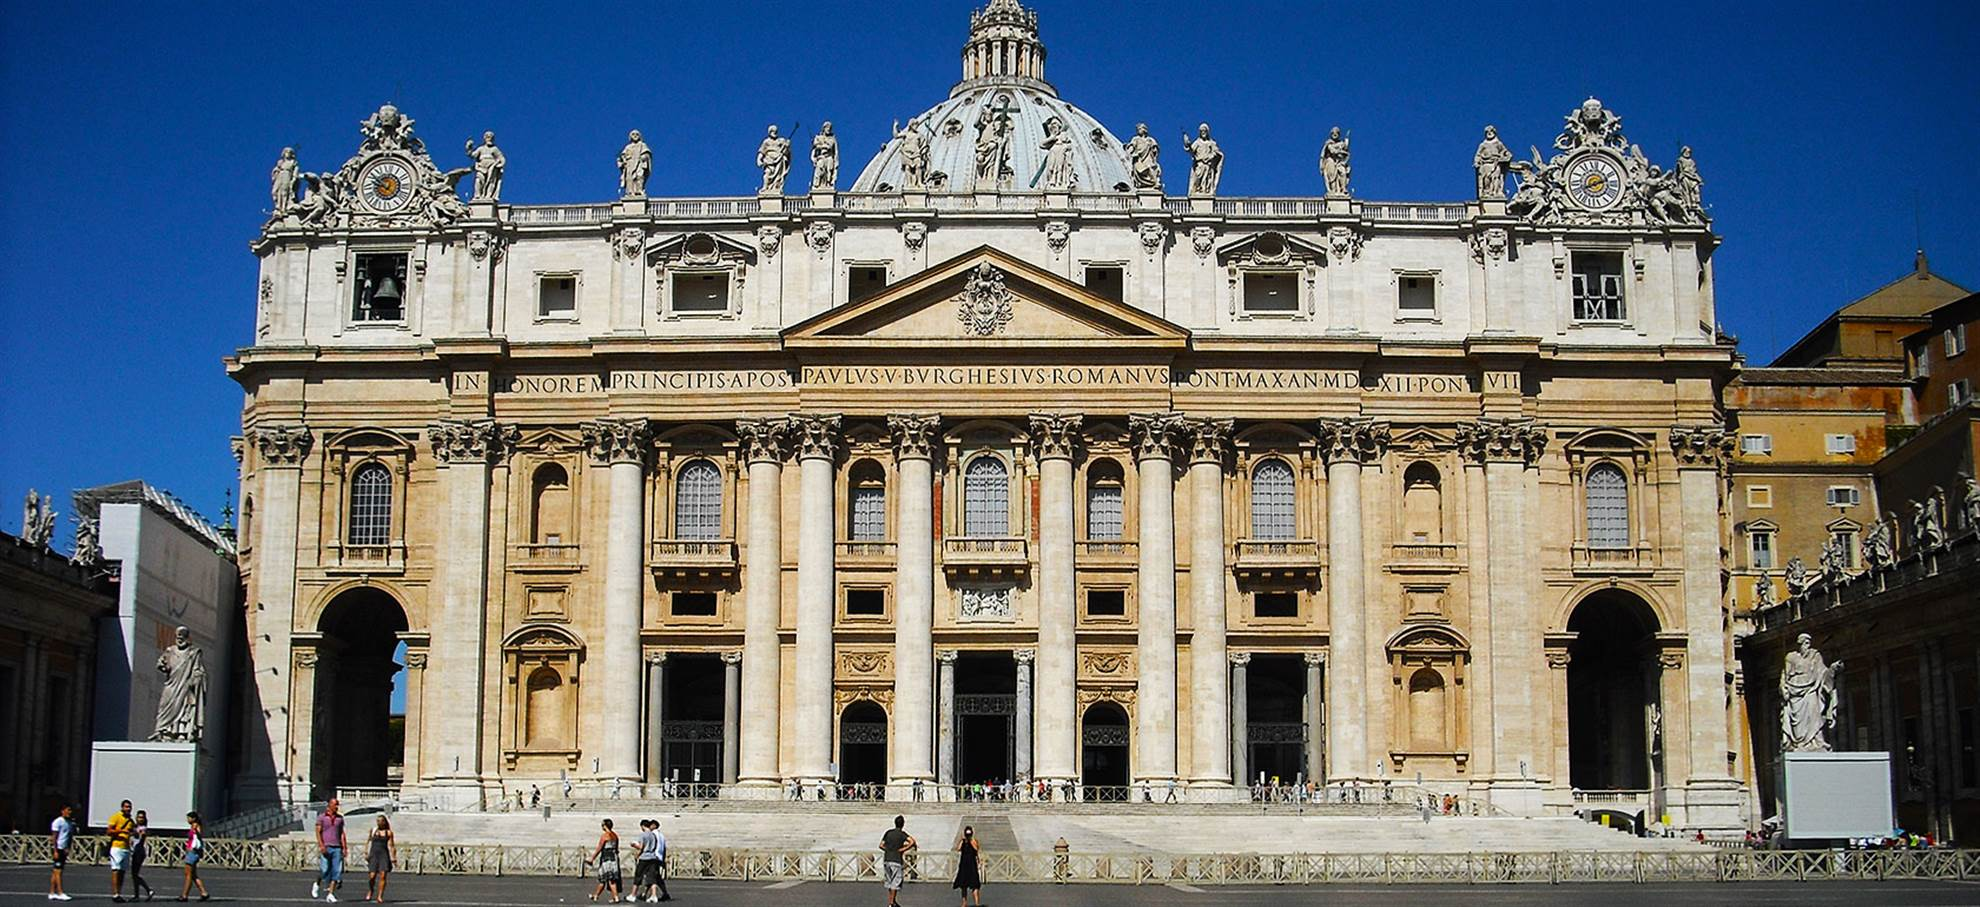 Basilica di San Pietro – Tour Guidato